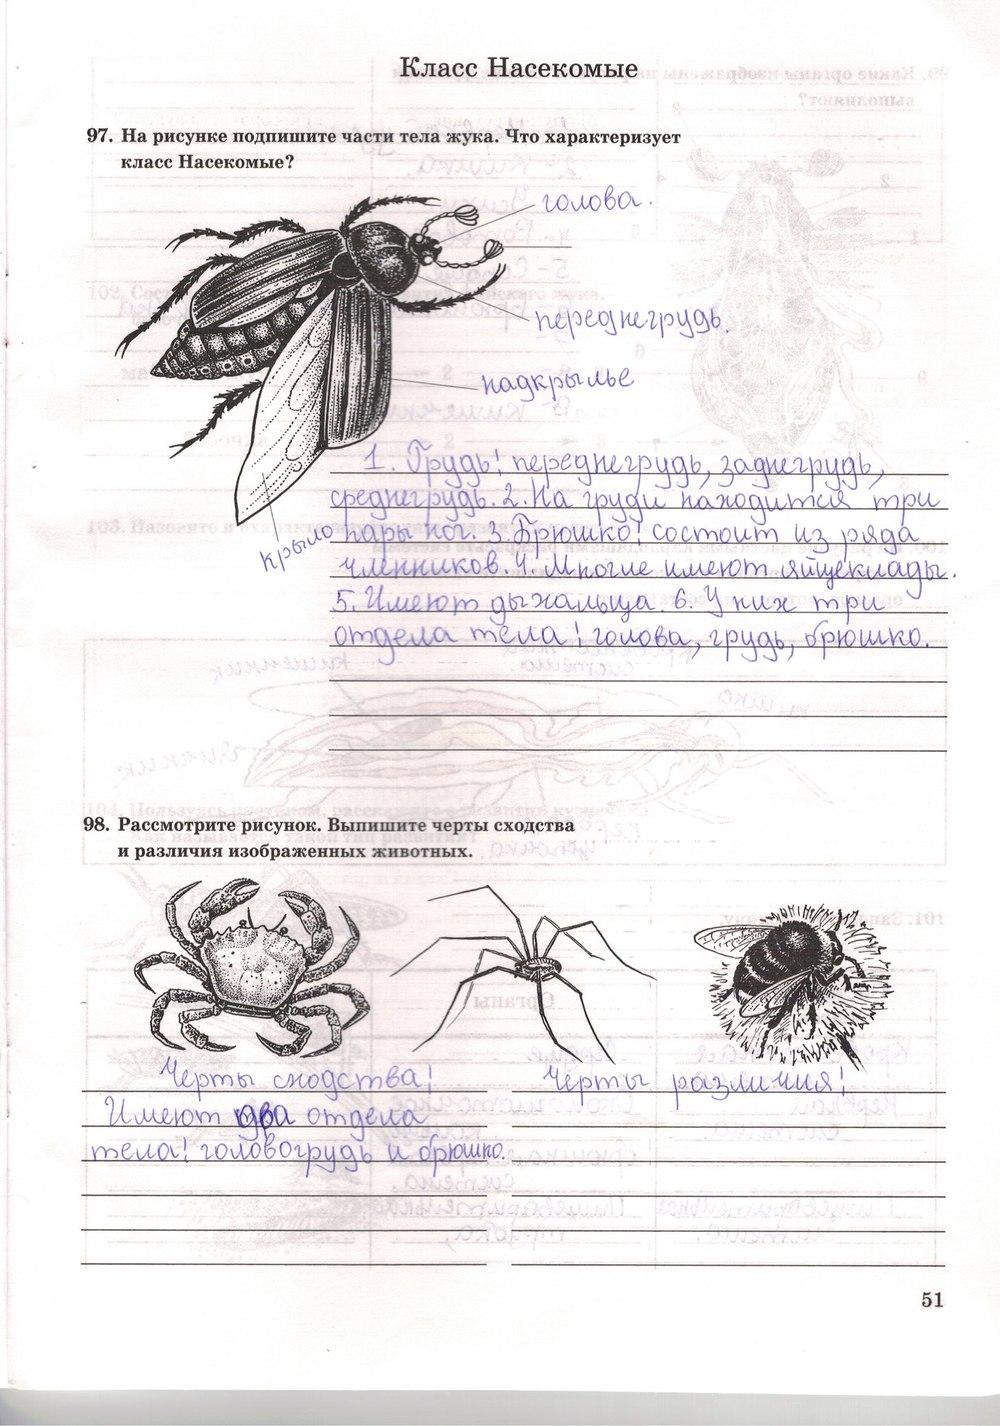 захаров гдз биология в.б н 7 класс